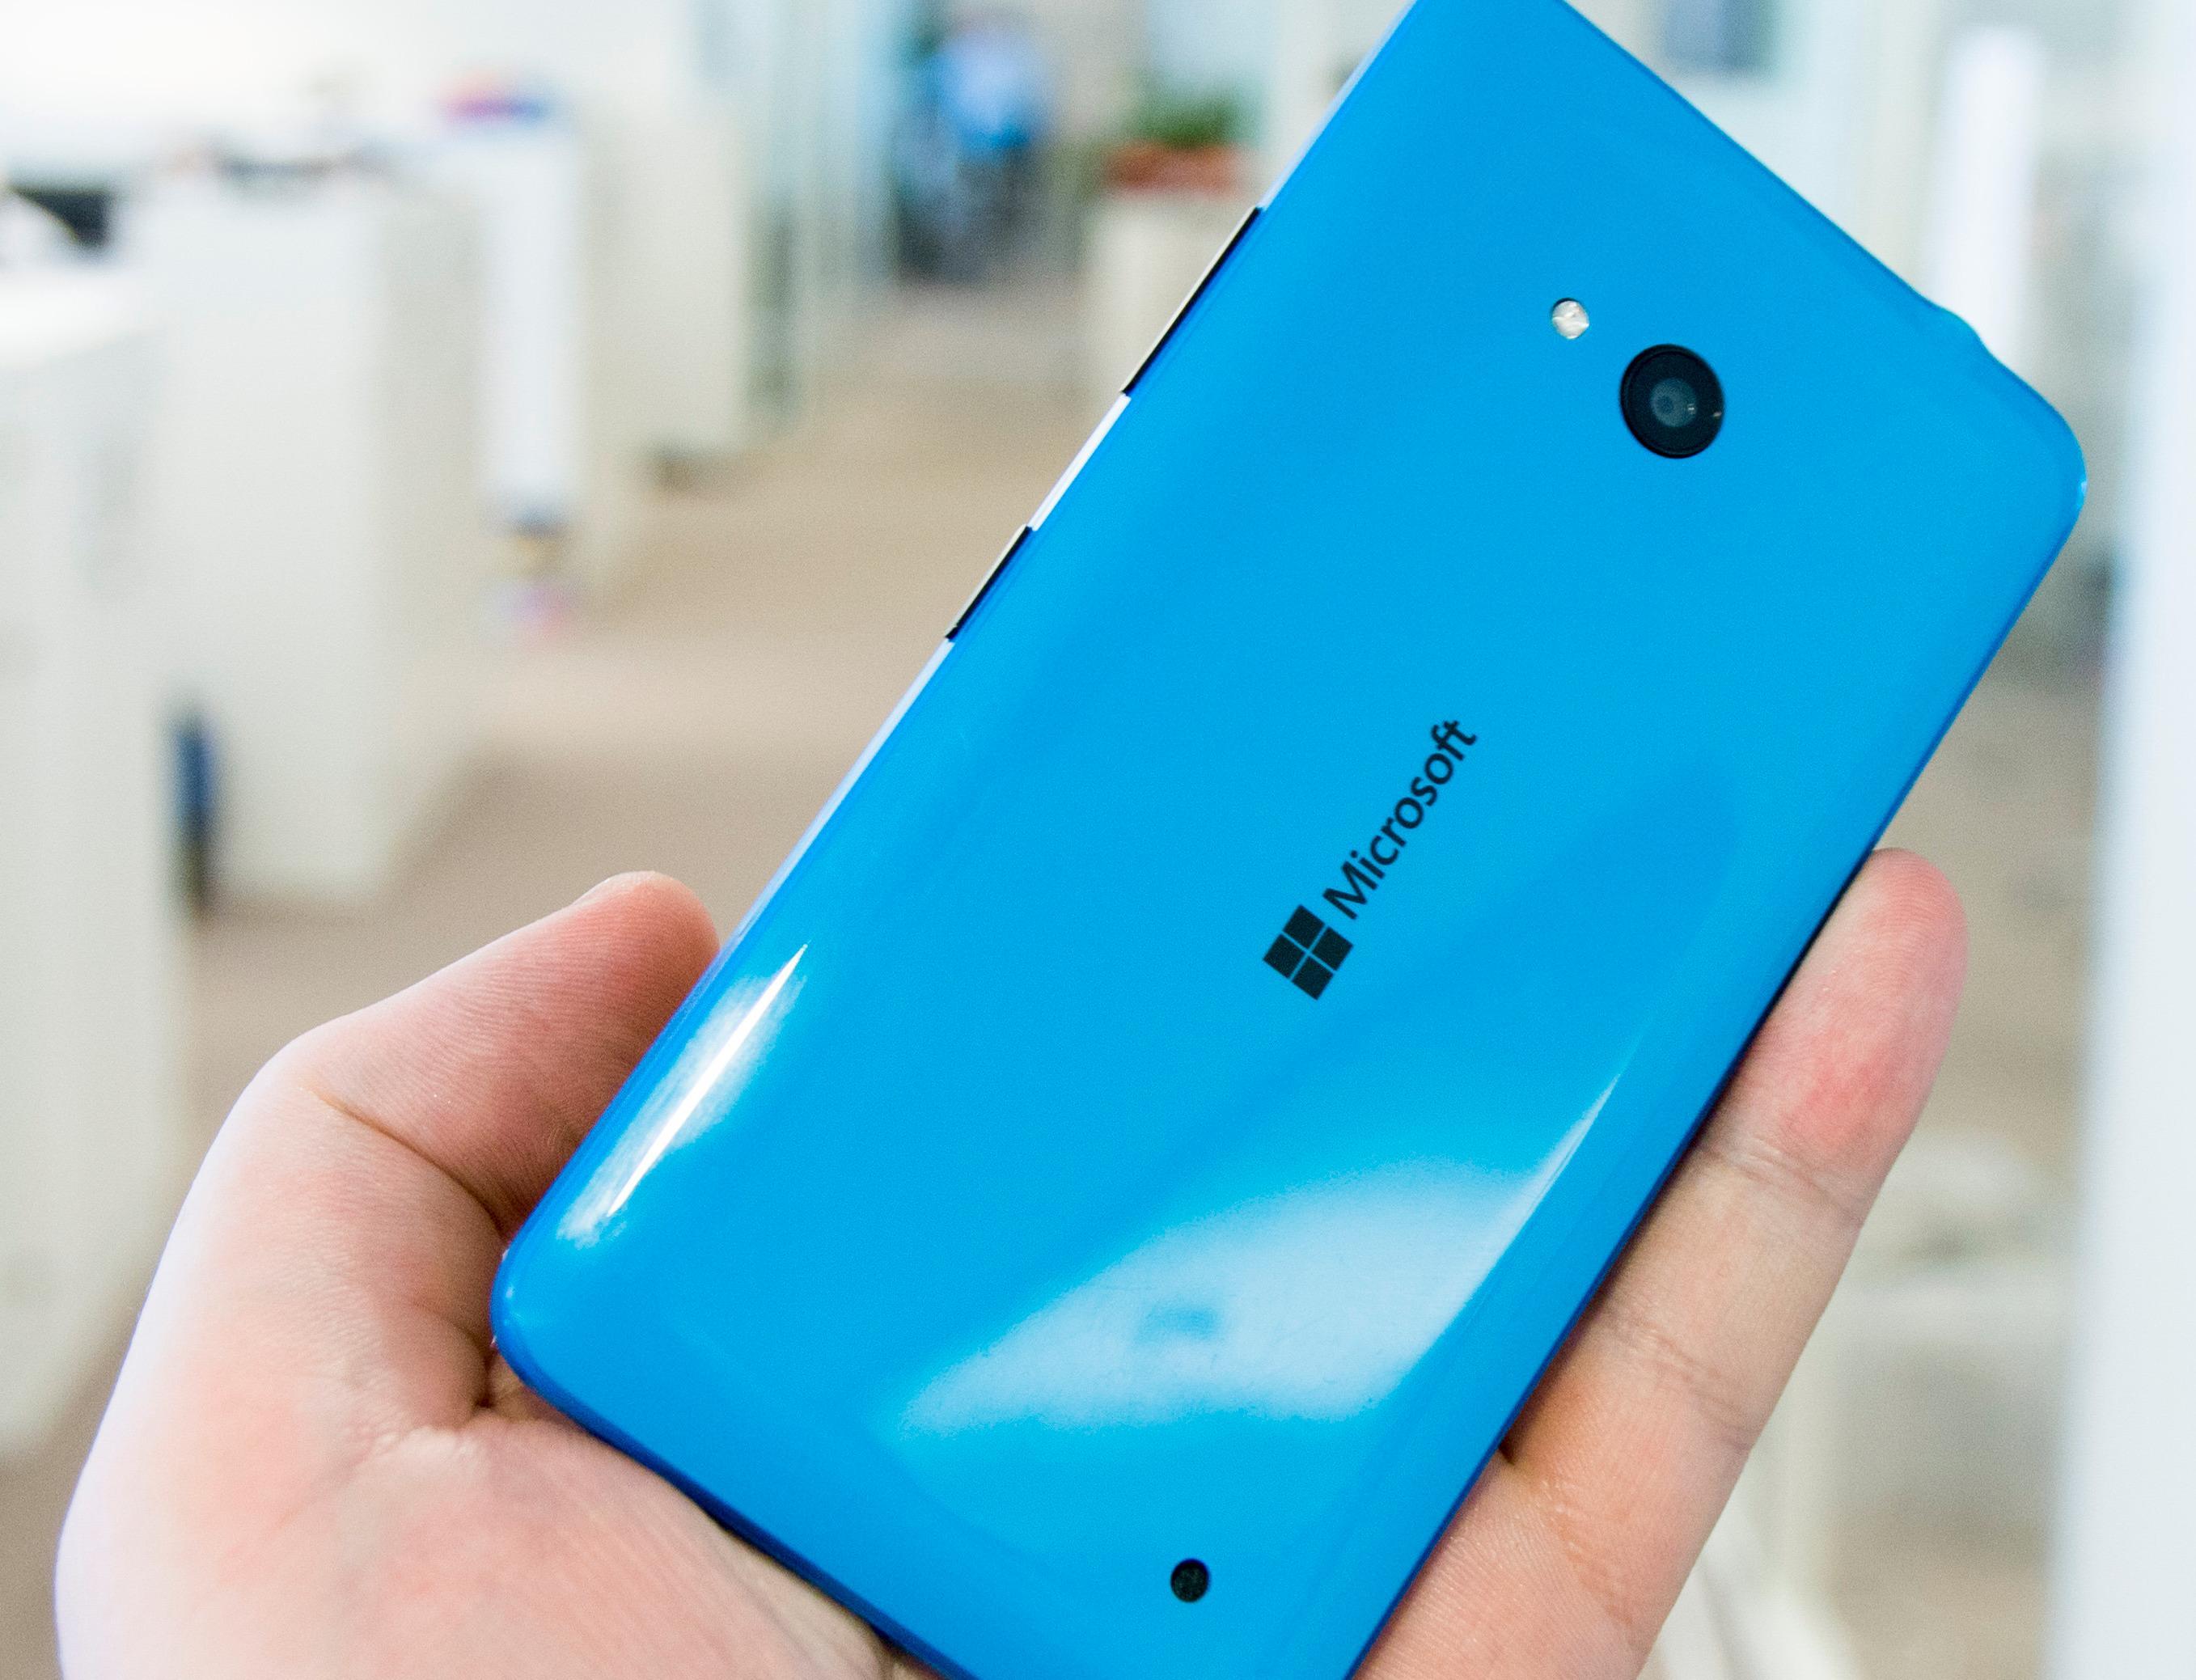 Microsofts Lumia 640 var den billigste telefonen vi tok med. Den koster omtrent 1400 kroner. Foto: Finn Jarle Kvalheim, Tek.no